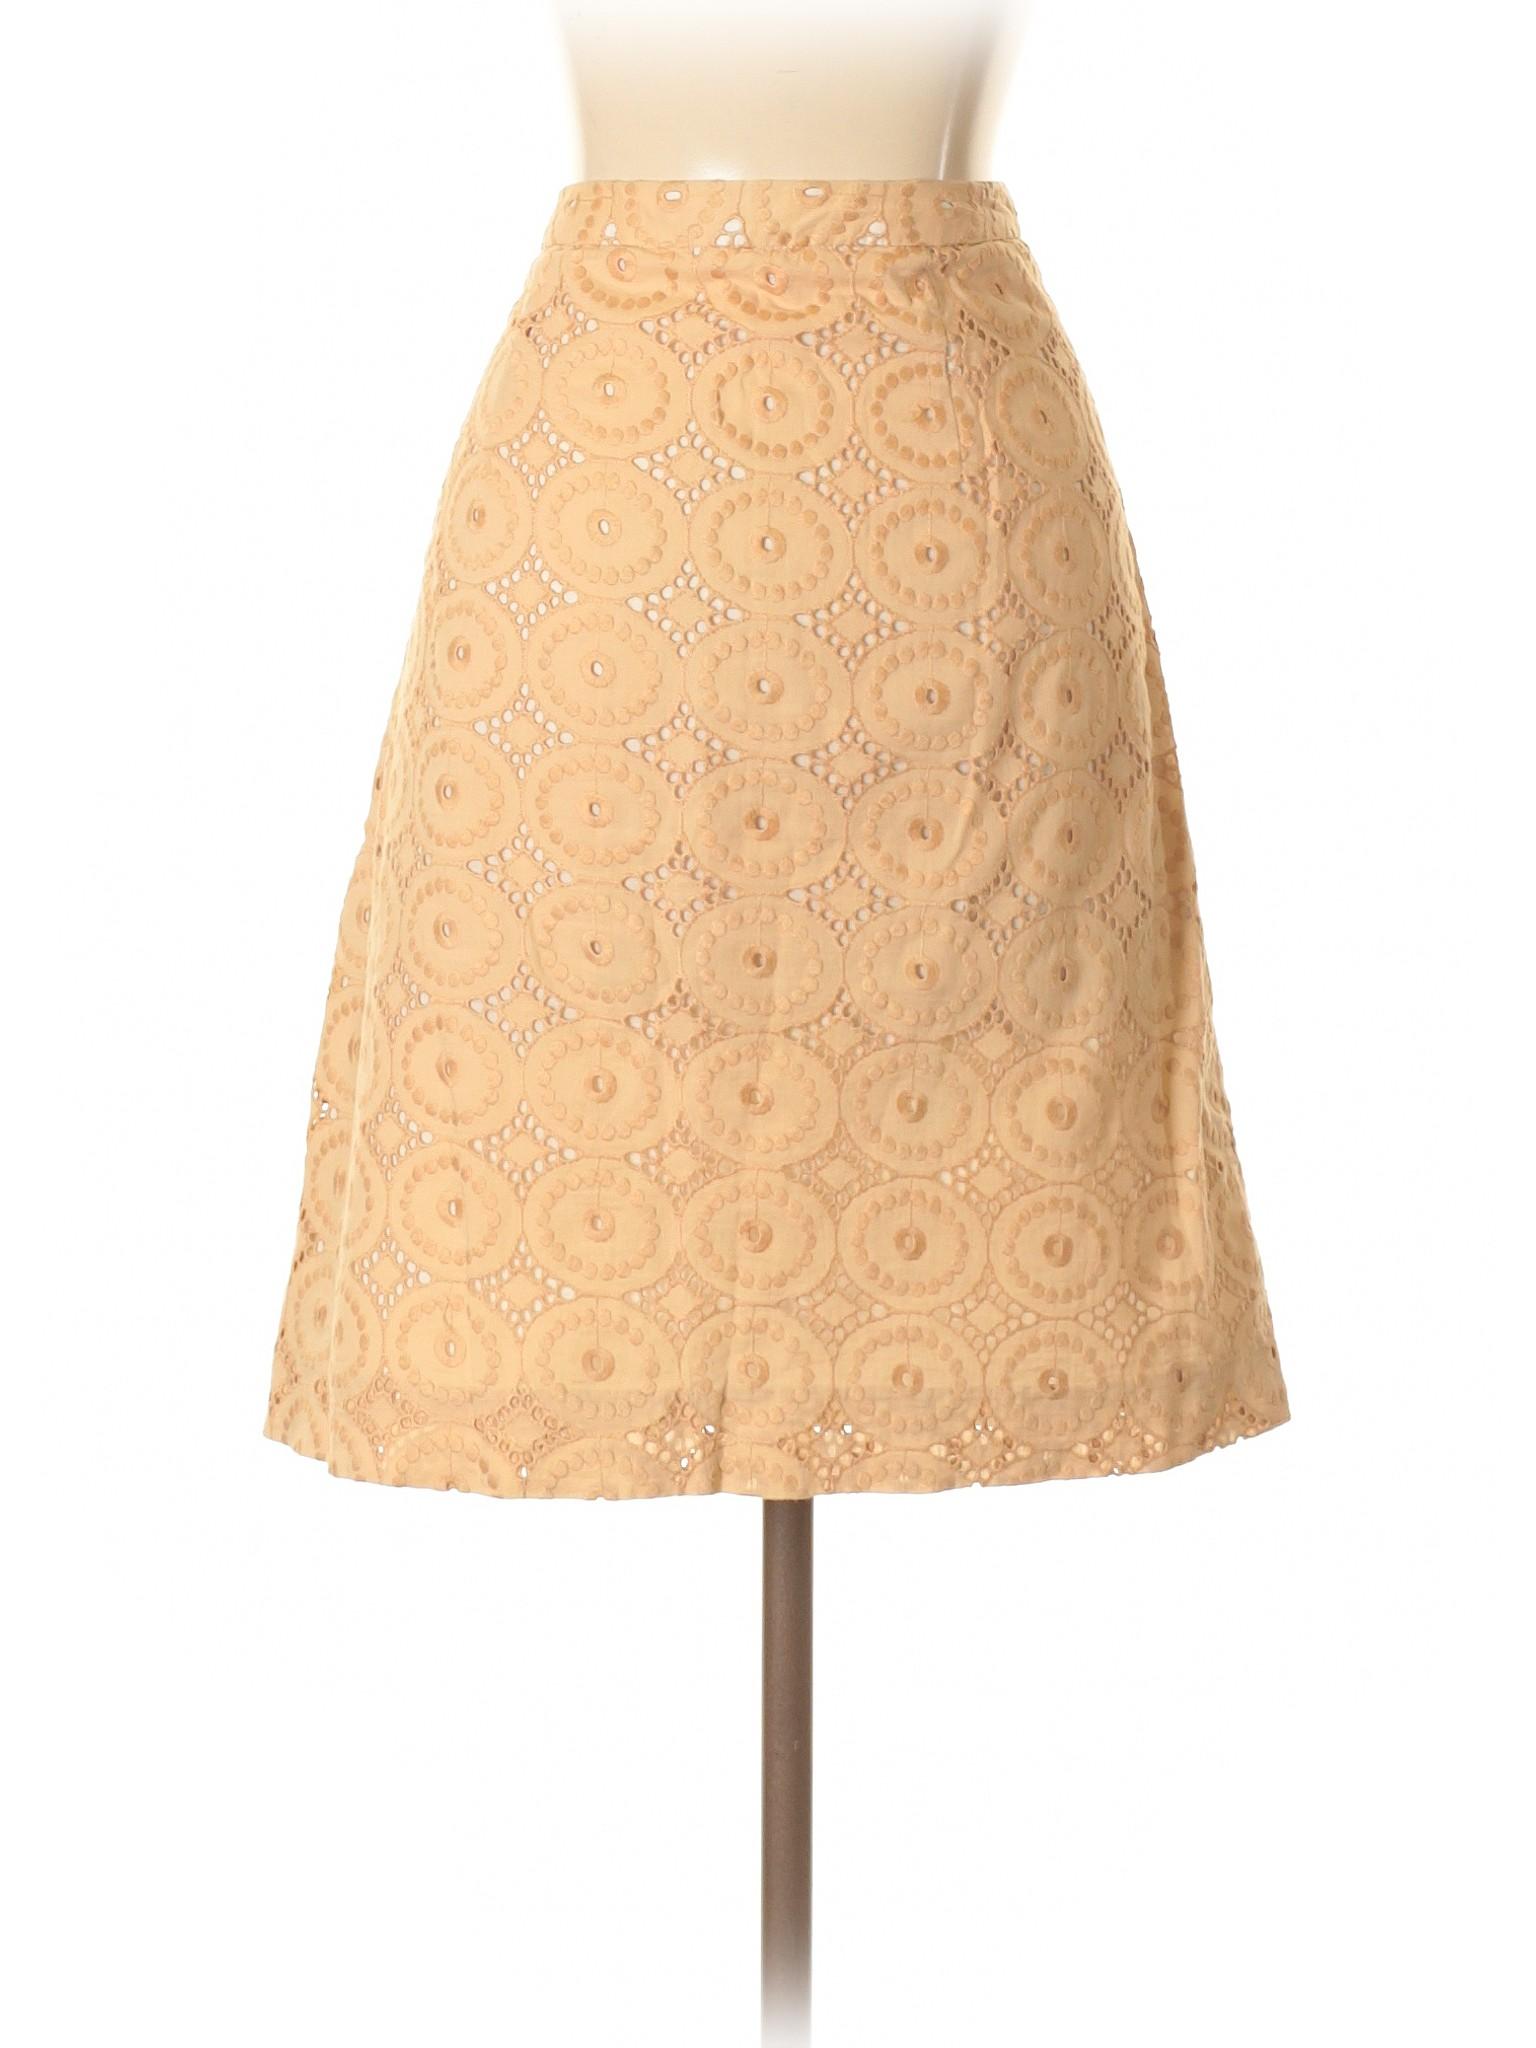 Republic Banana Skirt Casual Boutique Boutique Banana wqEtX